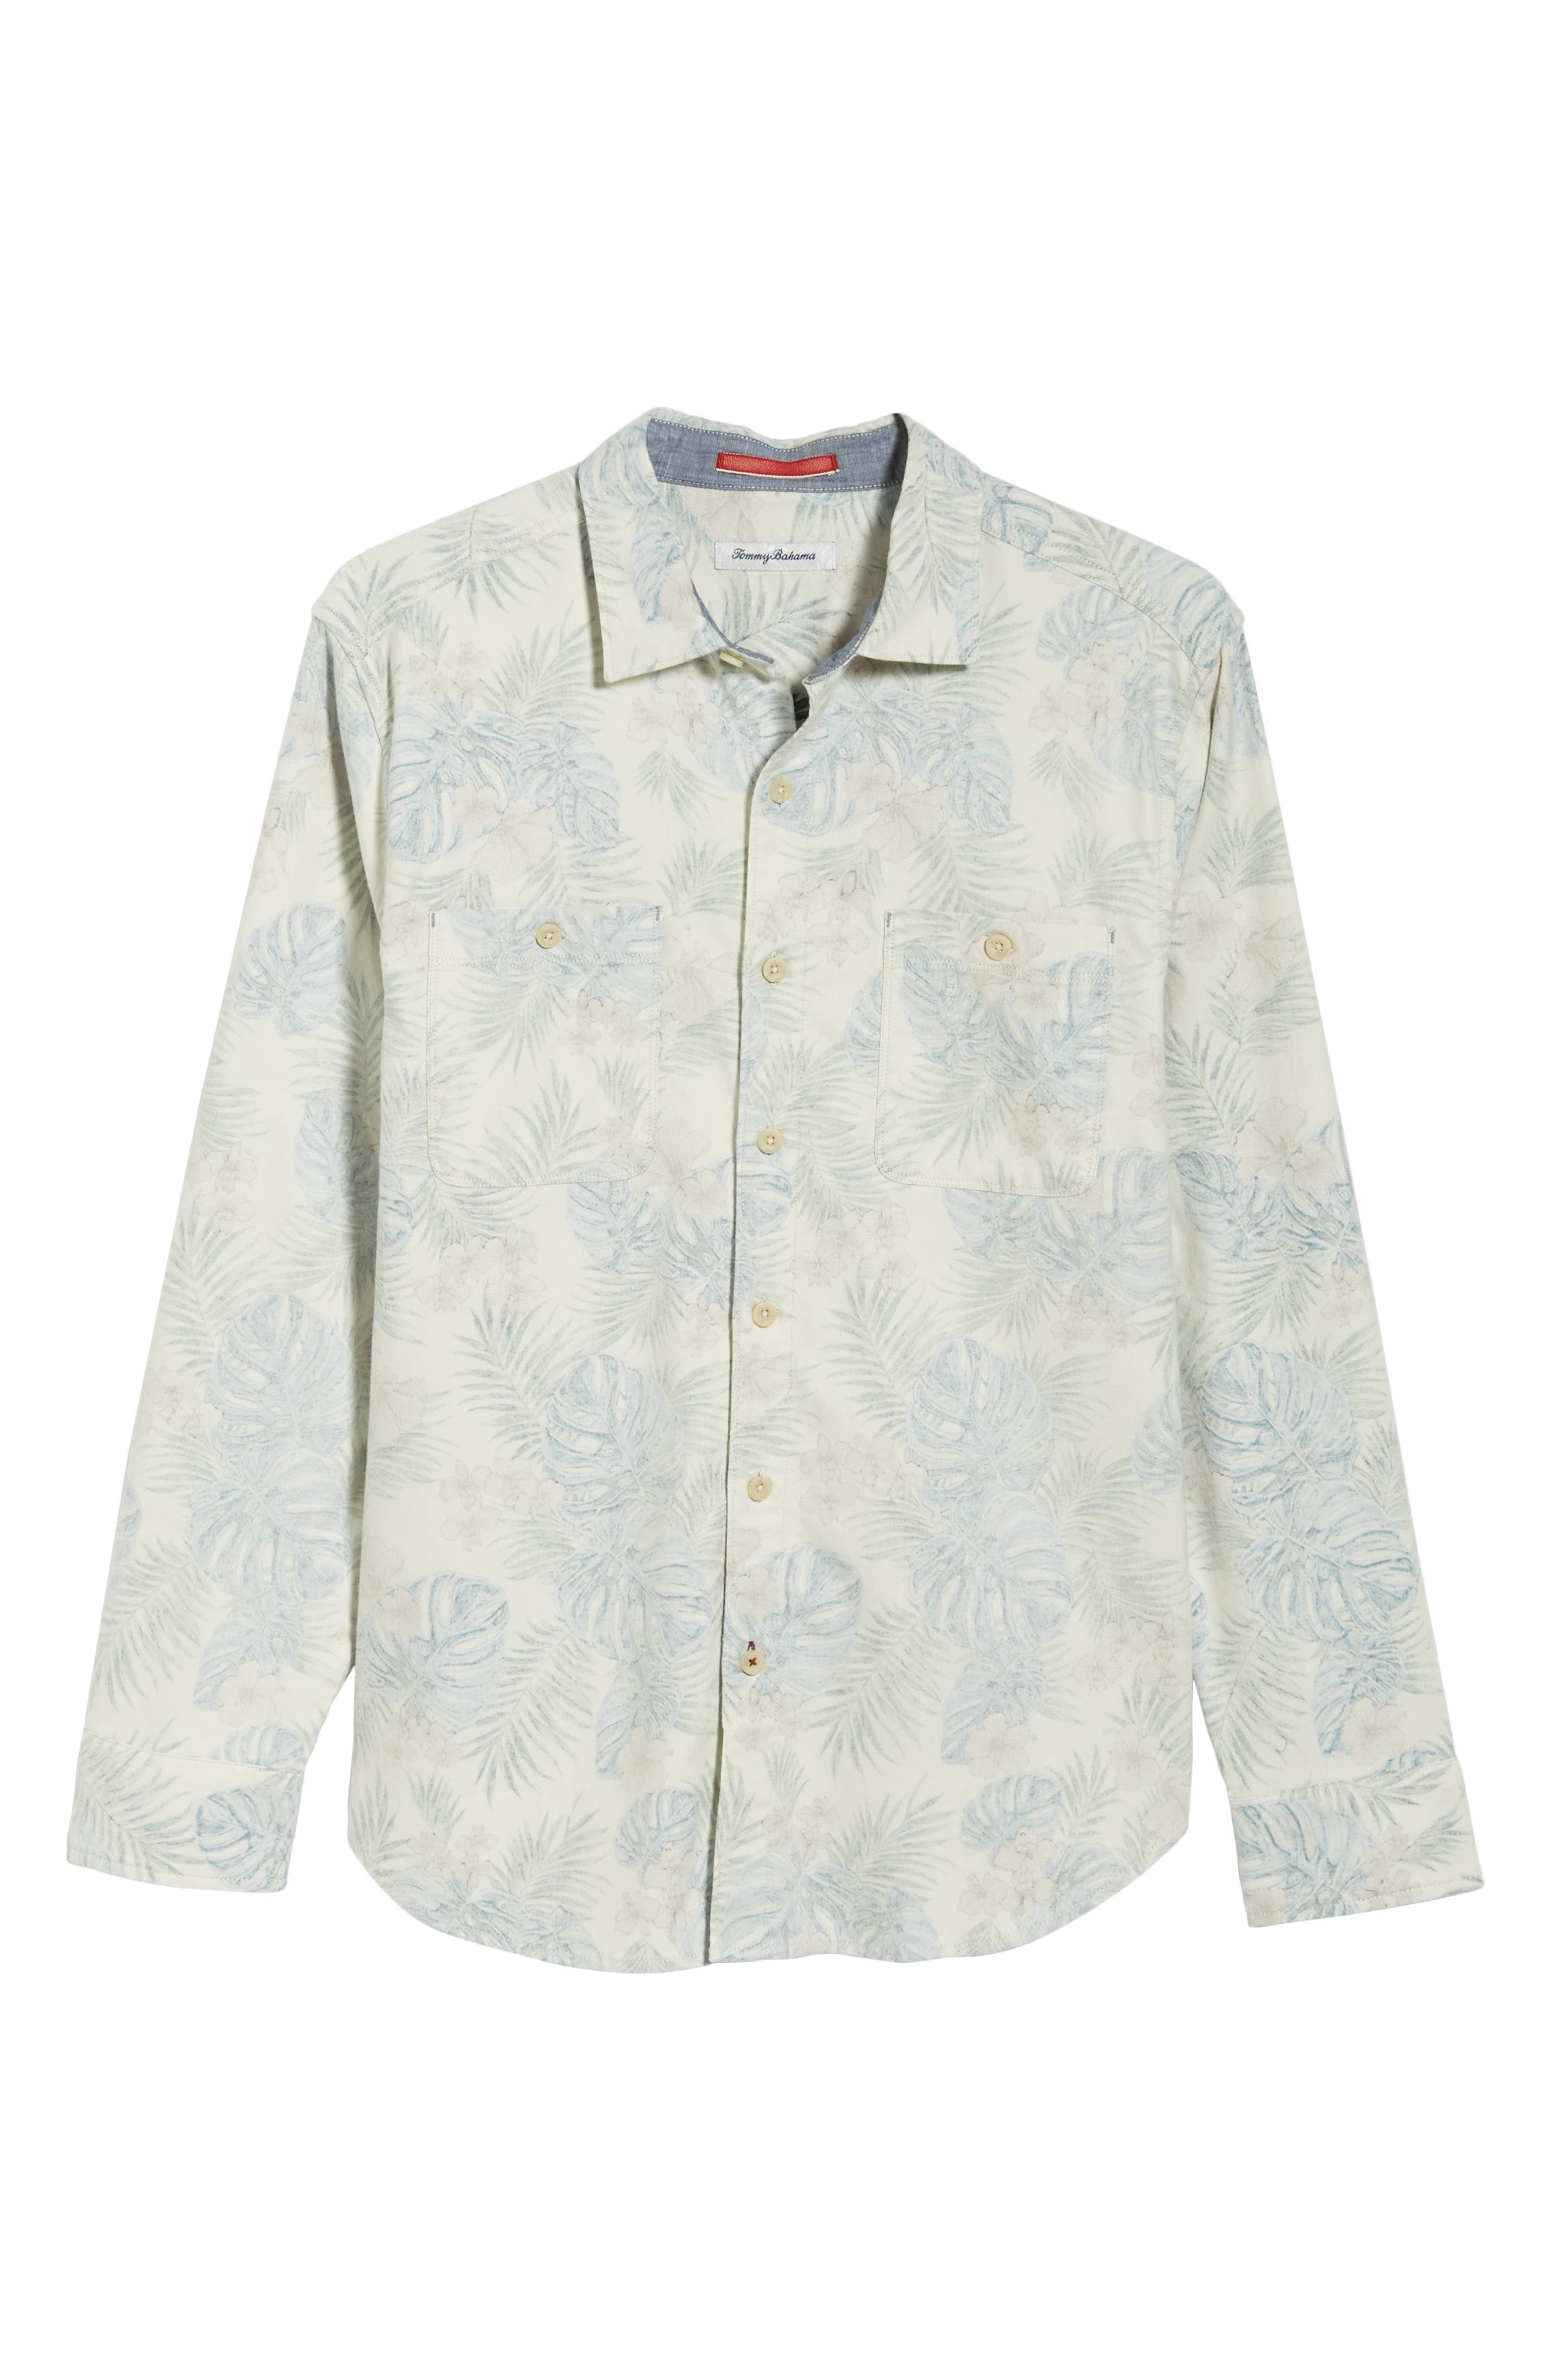 TOMMY BAHAMA, Beach Palms Long Sleeve Flannel Sport Shirt, Alternate thumbnail 6, color, 200